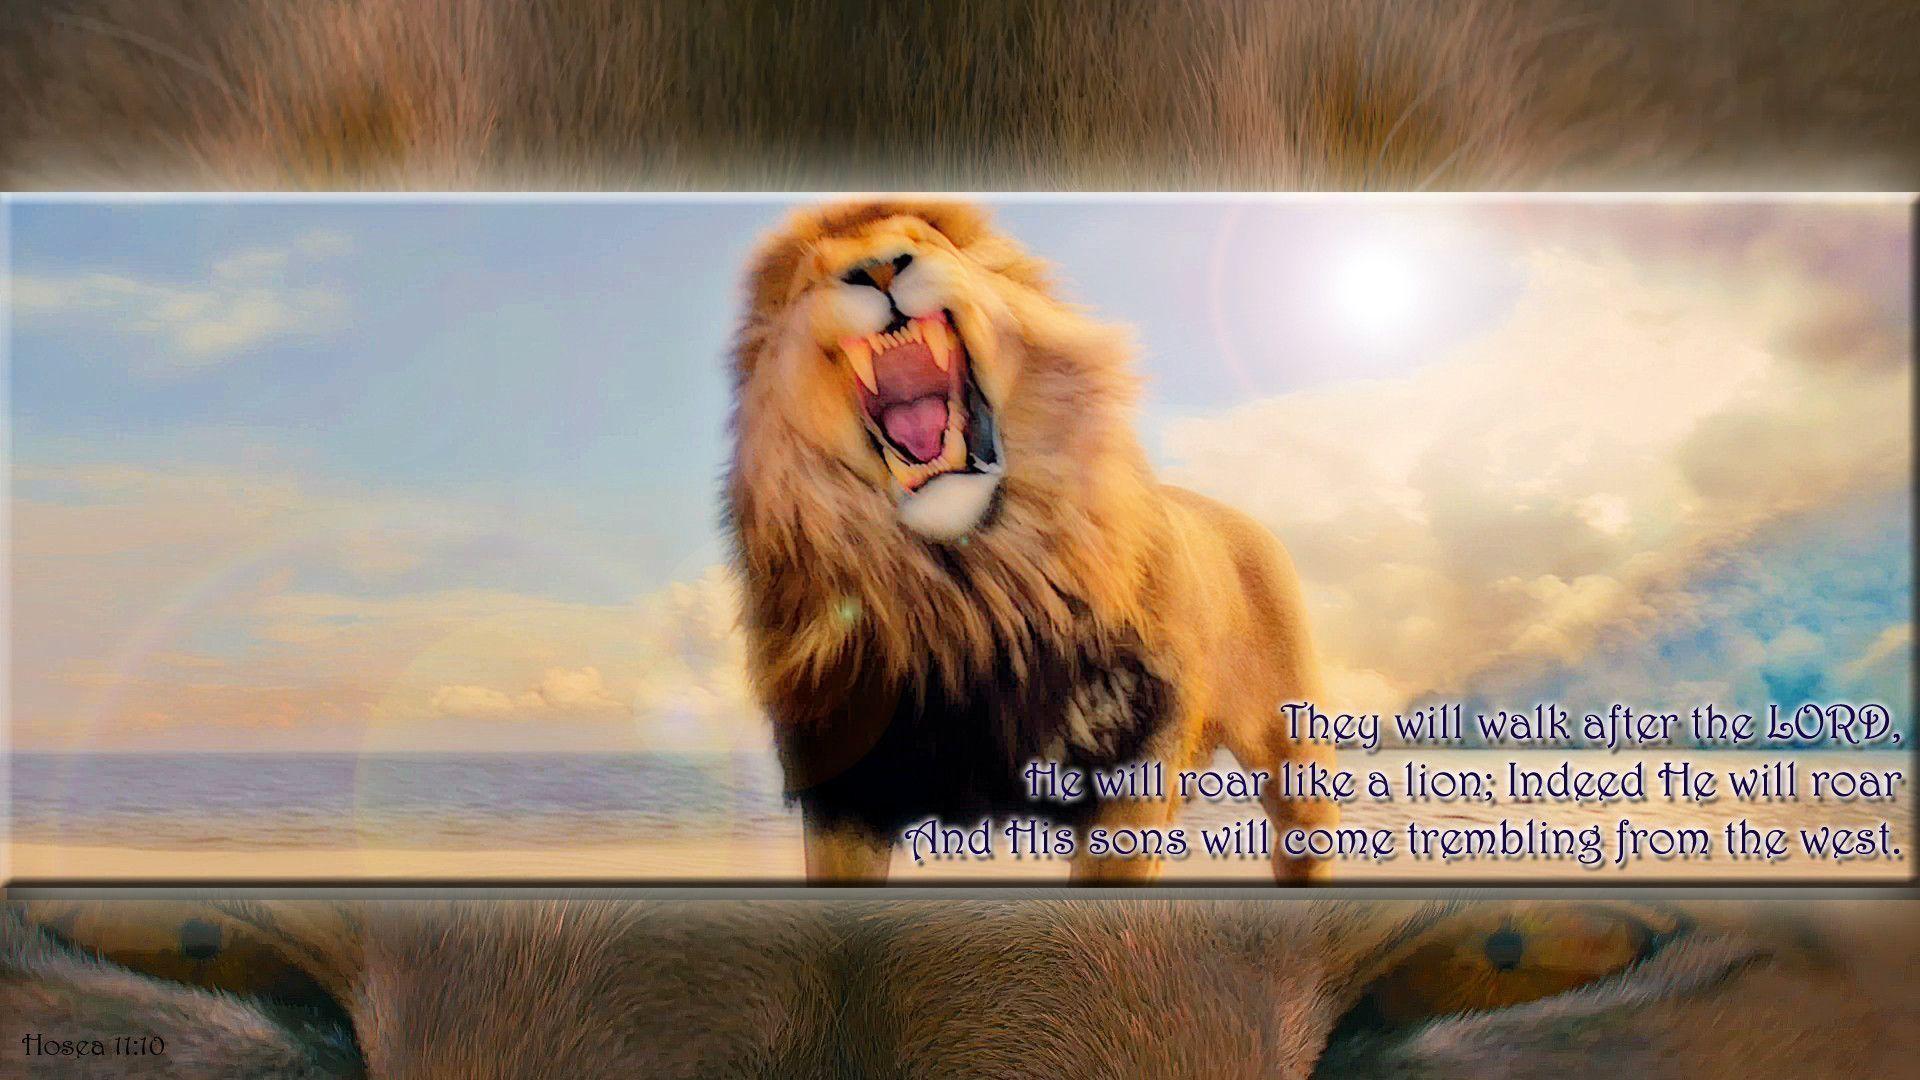 narnia aslan wallpaper (68+ images)